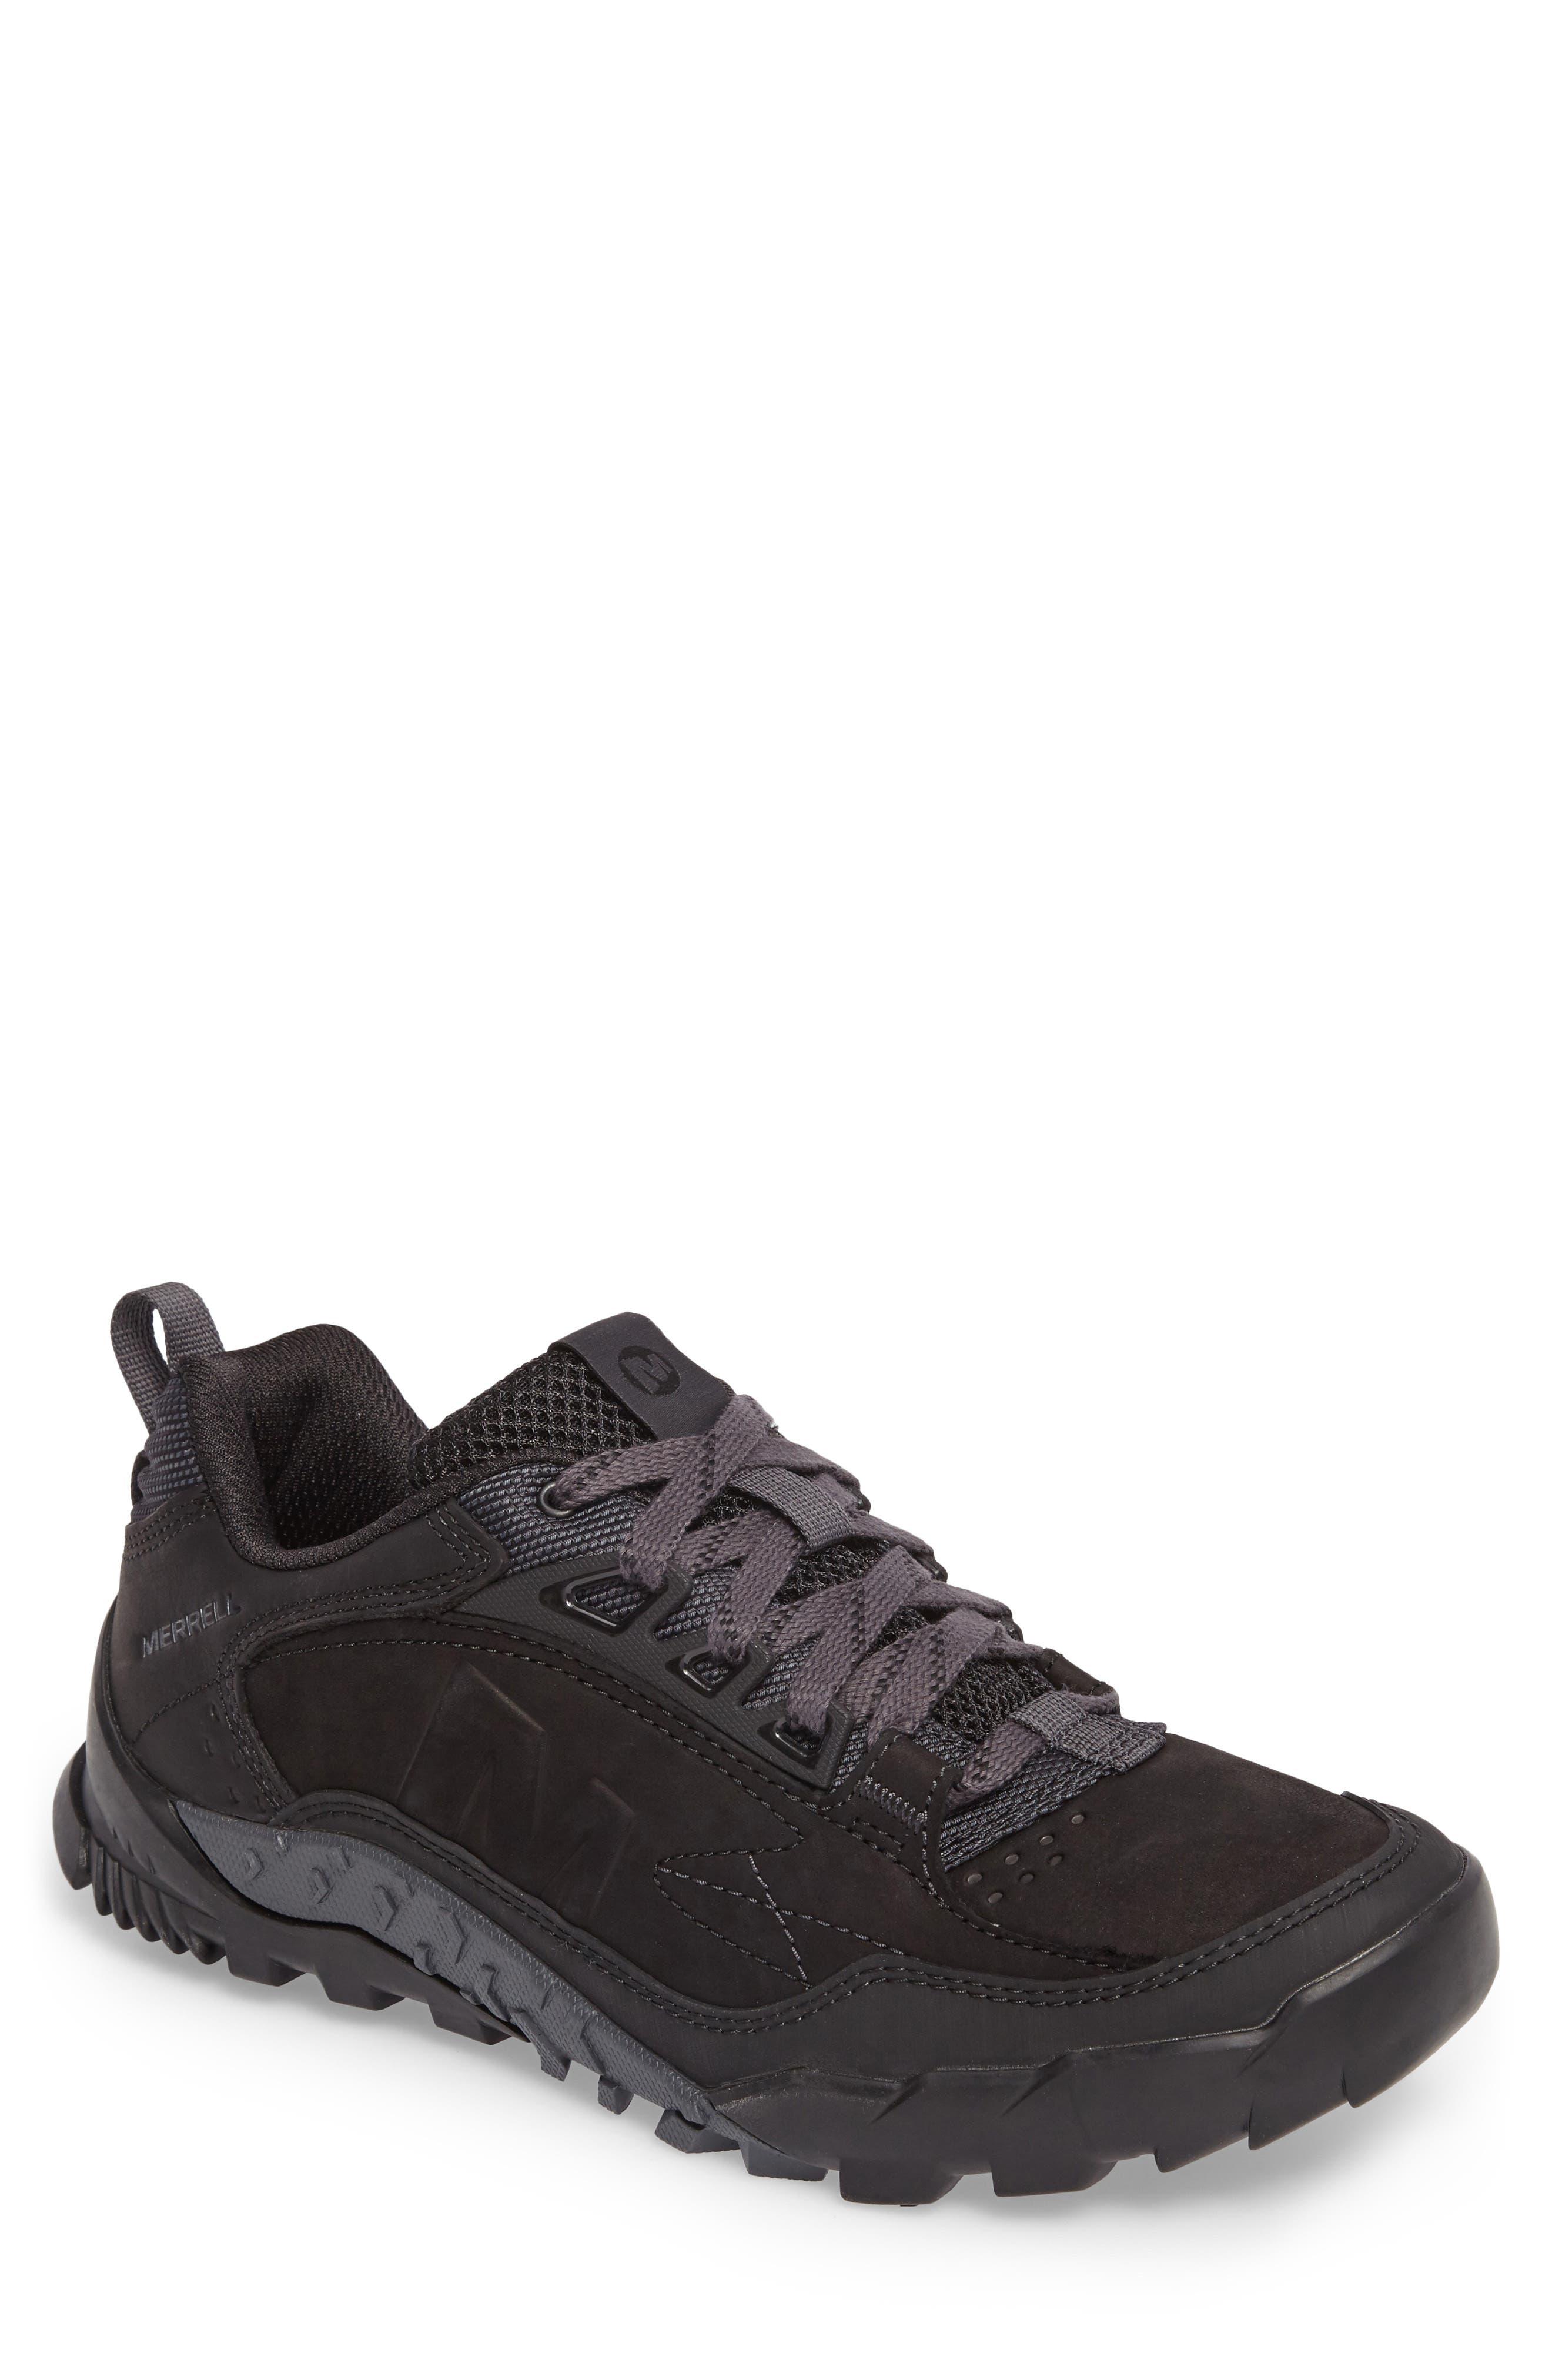 Annex Tak Low Hiking Shoe,                         Main,                         color, BLACK NUBUCK LEATHER